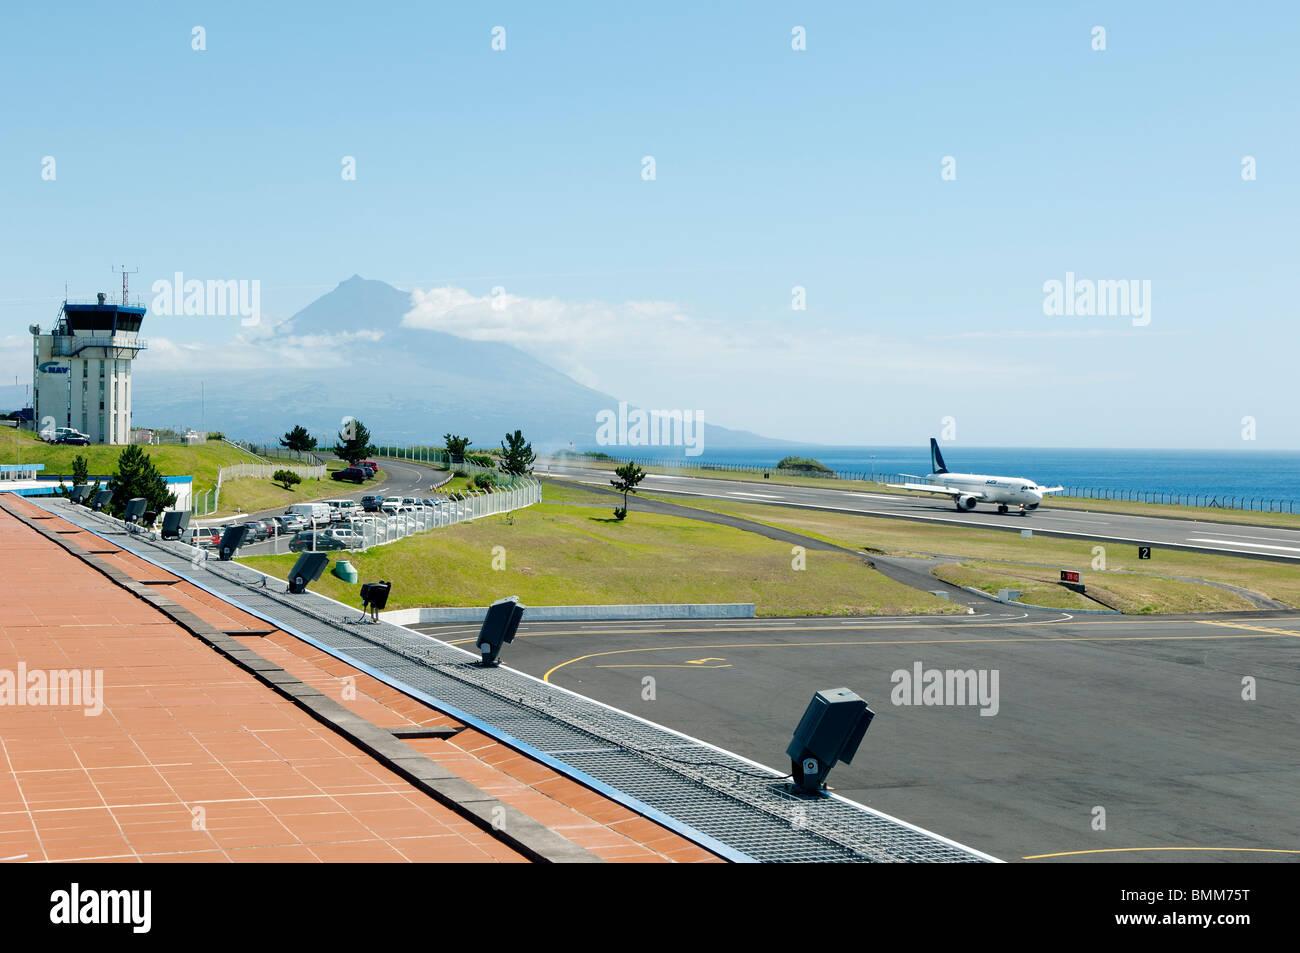 Jetliner of Sata International landing in Faial airport, Azores - Stock Image